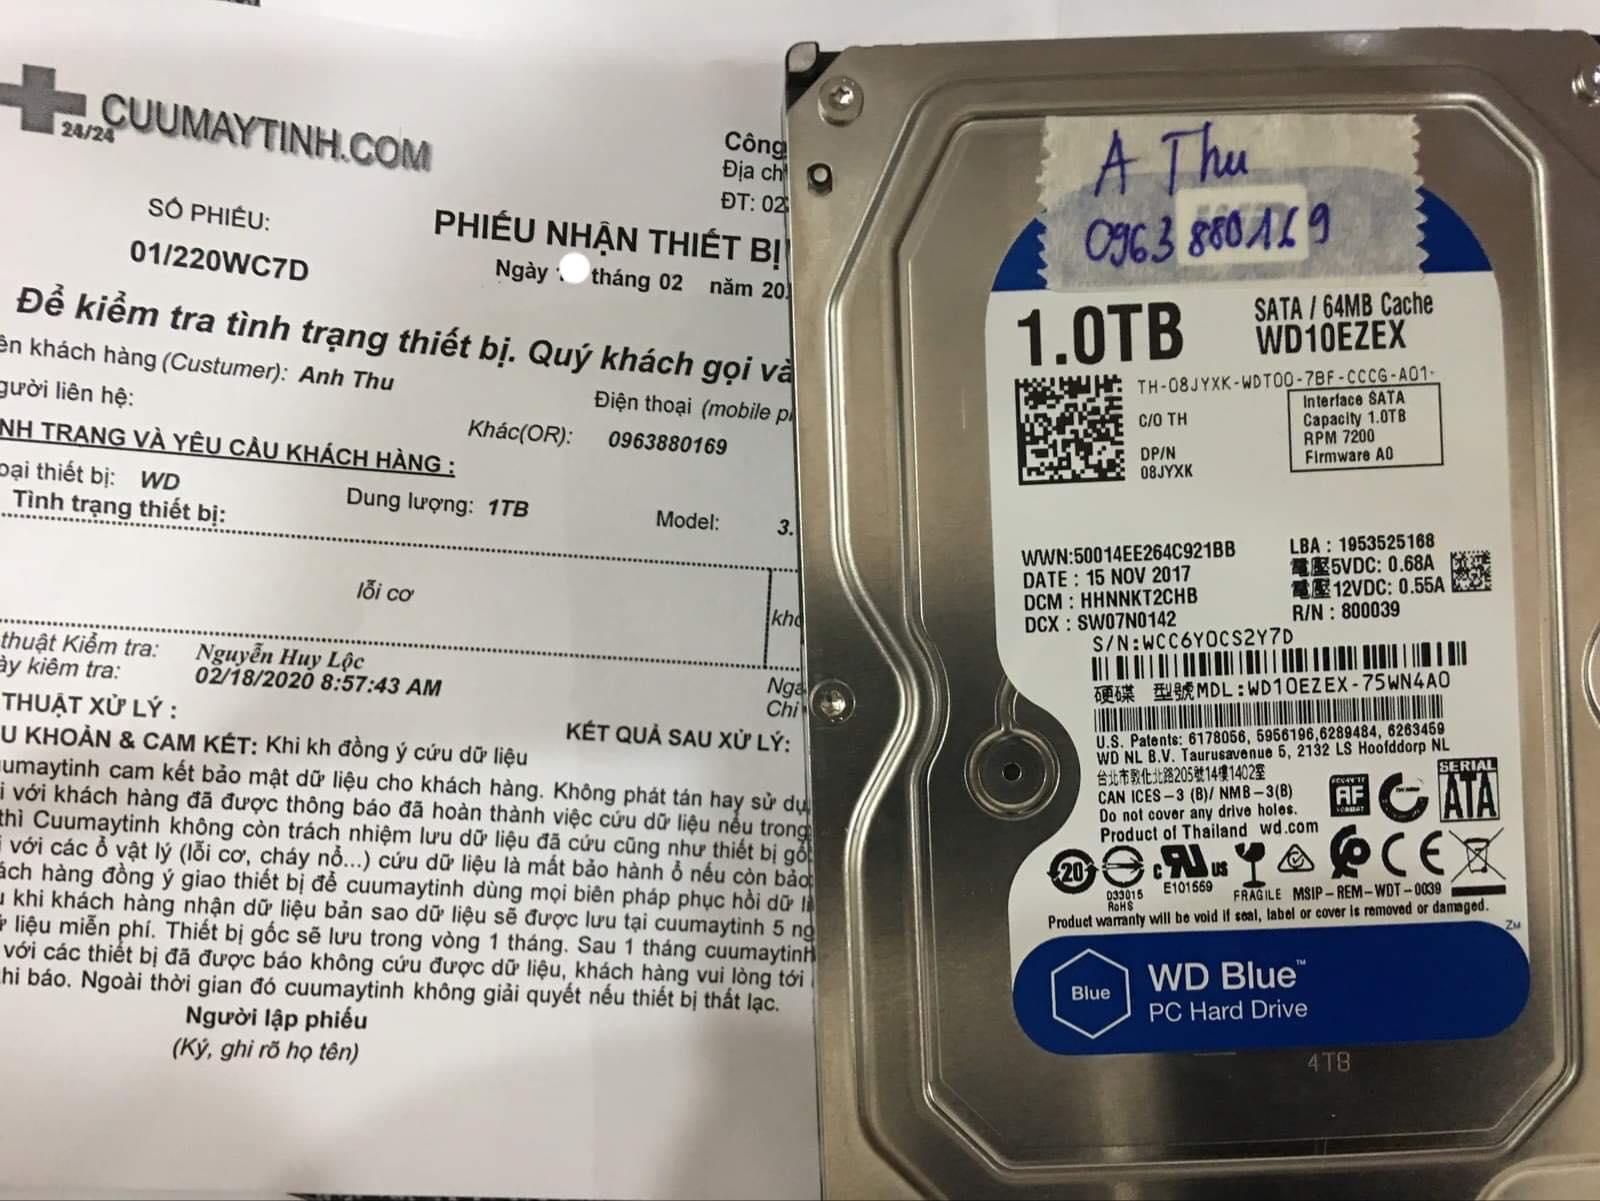 Phục hồi dữ liệu ổ cứng Western 1TB lỗi cơ 19/02/2020 - cuumaytinh